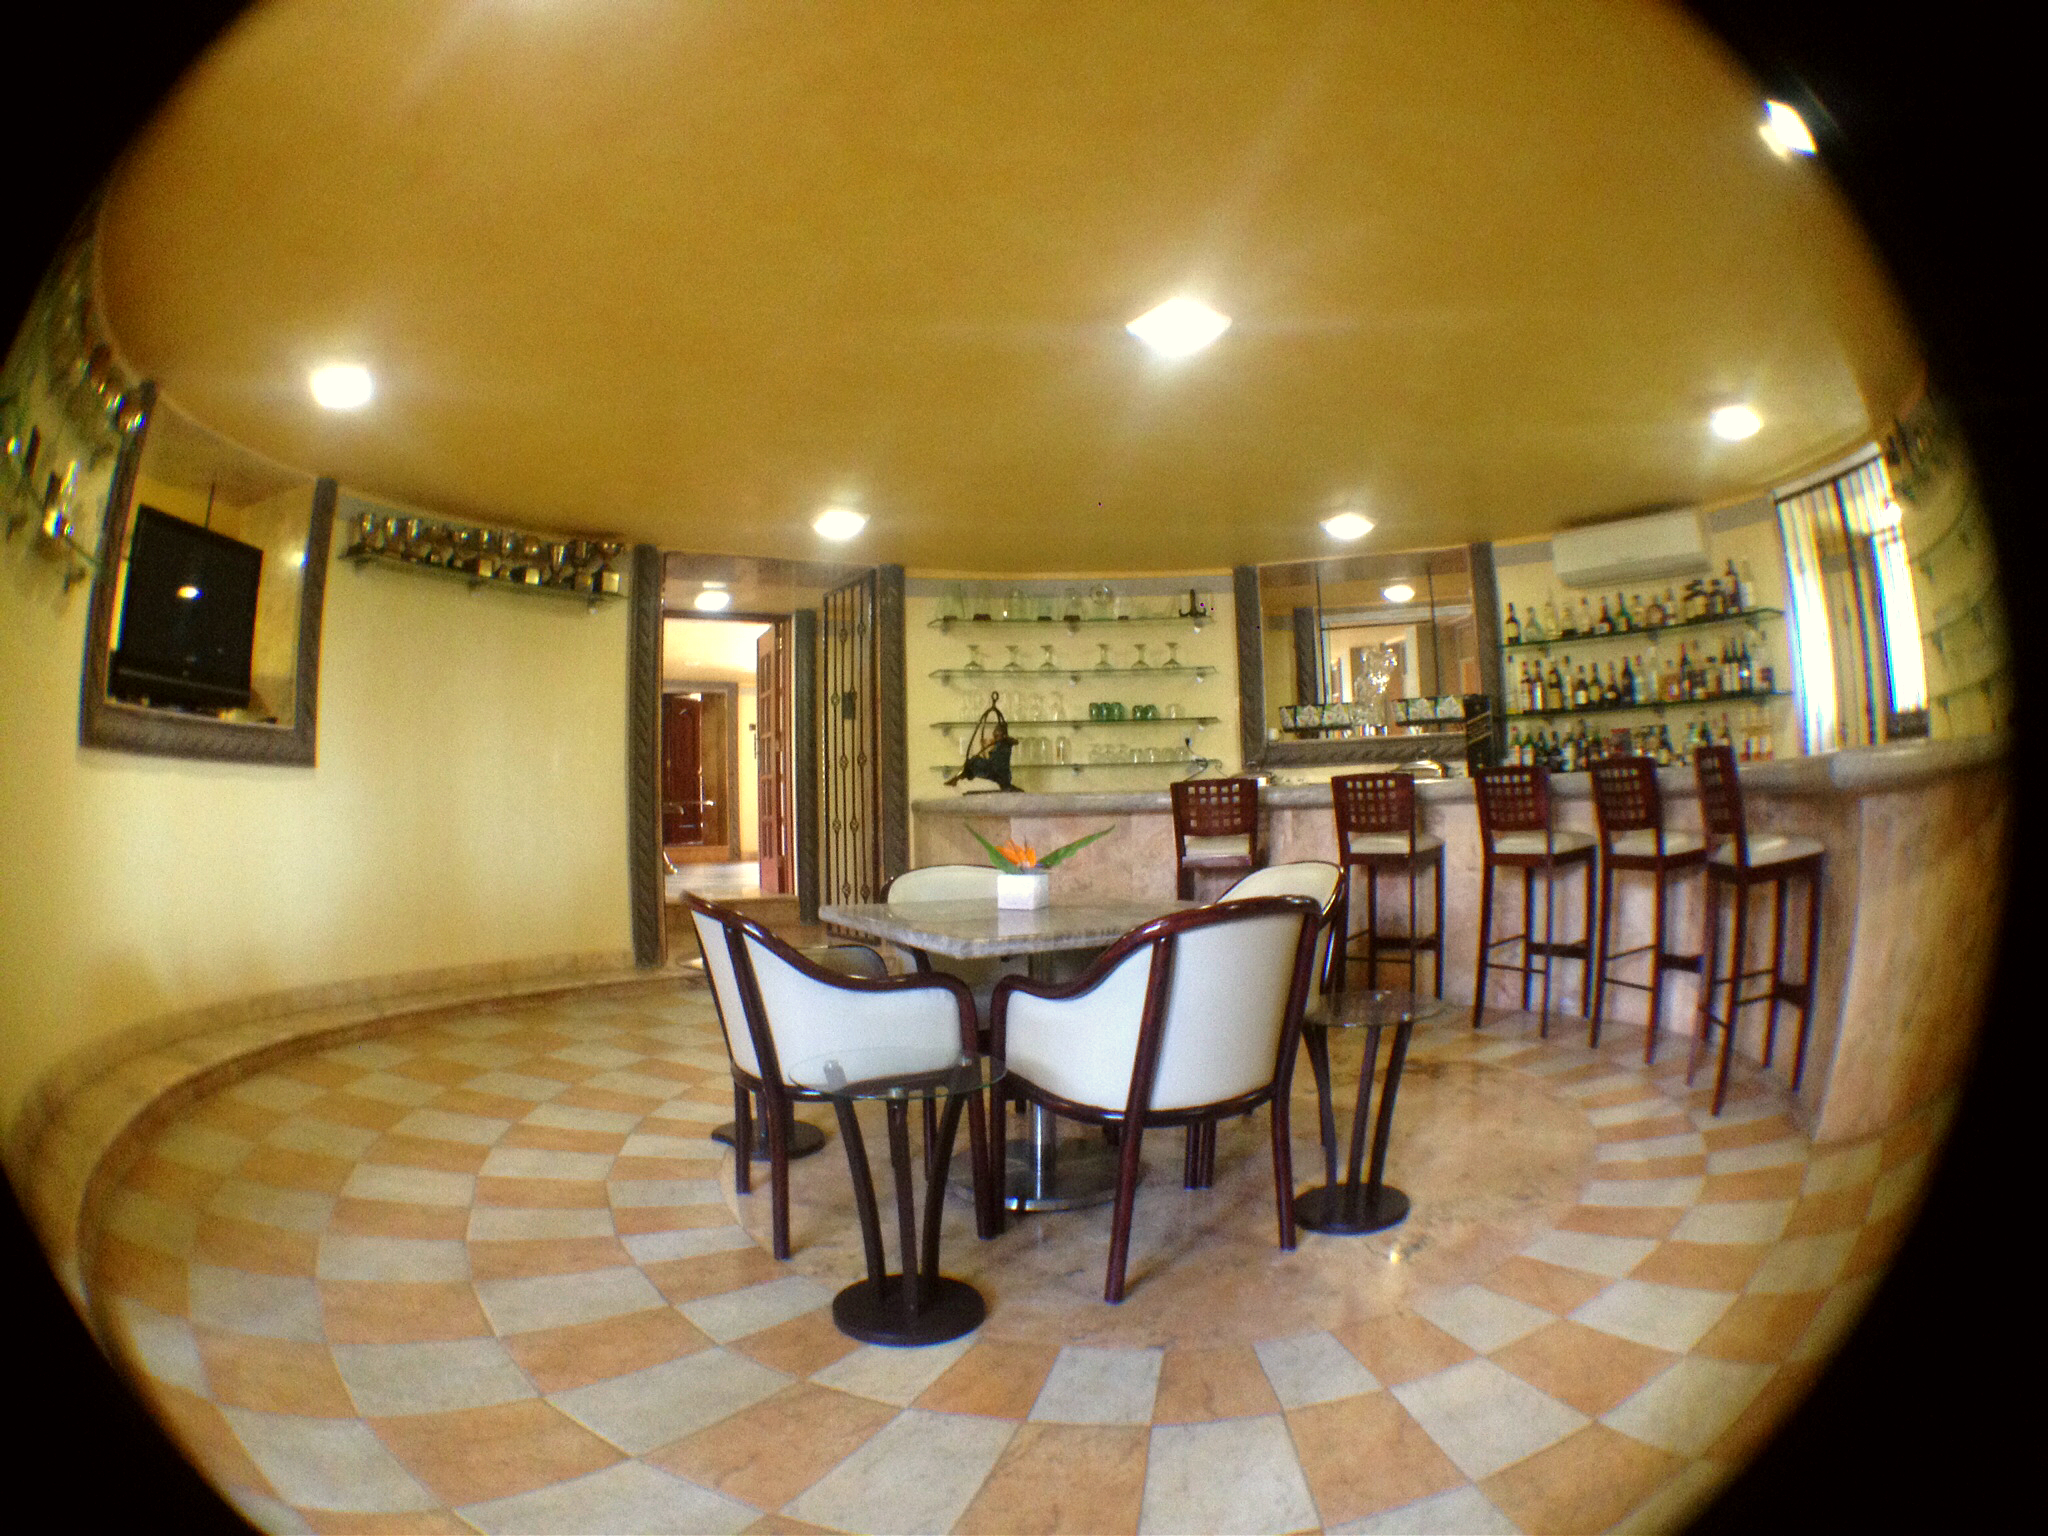 Bar torre secundaria villa toscana.jpg